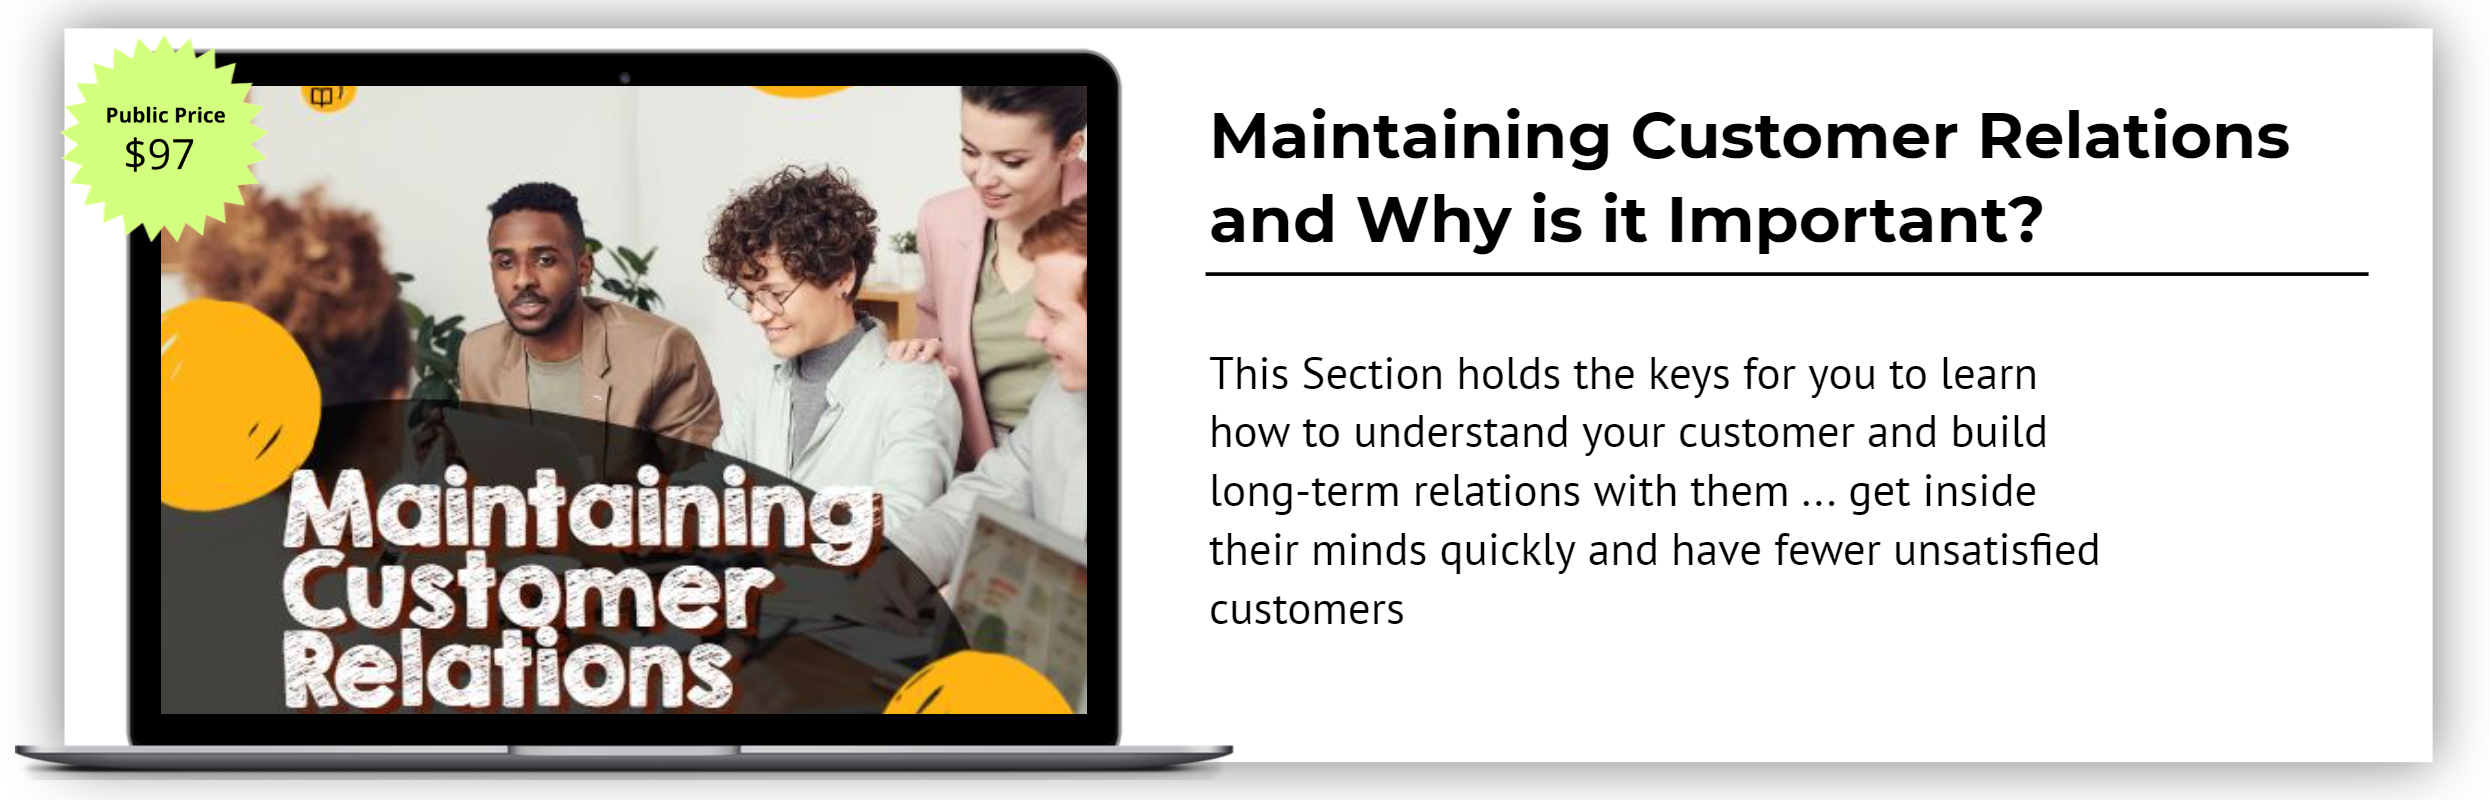 Maintaining Customer Relations